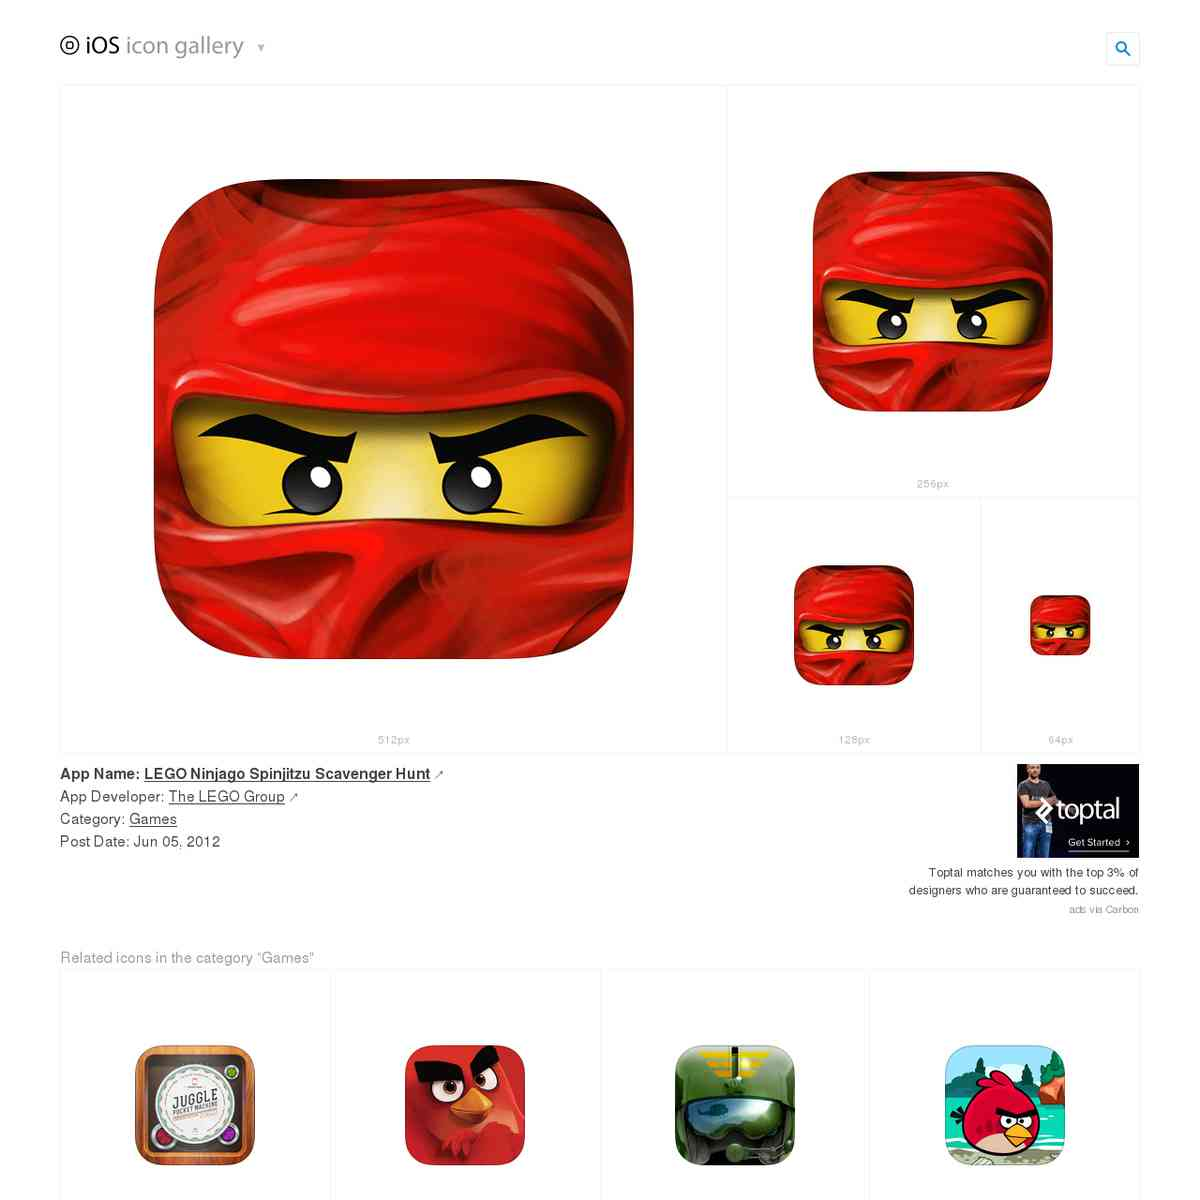 iosicongallery.com/games/lego-ninjago-spinjitzu-scavenger-hunt/